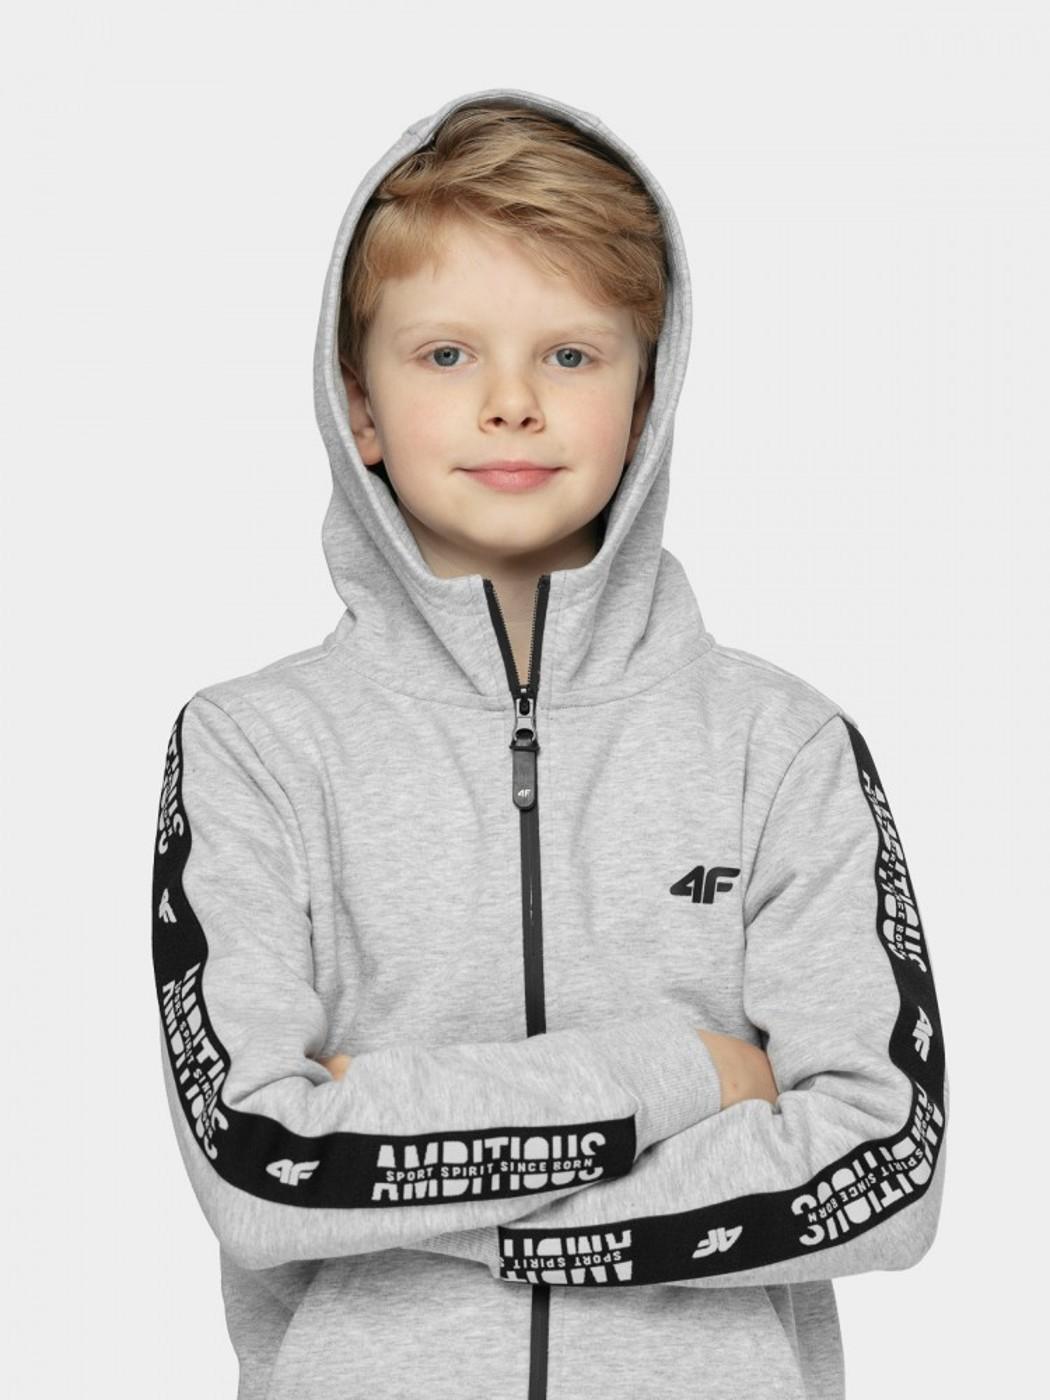 4F BOY S SWEATSHIRT JBLM003A - Kinder